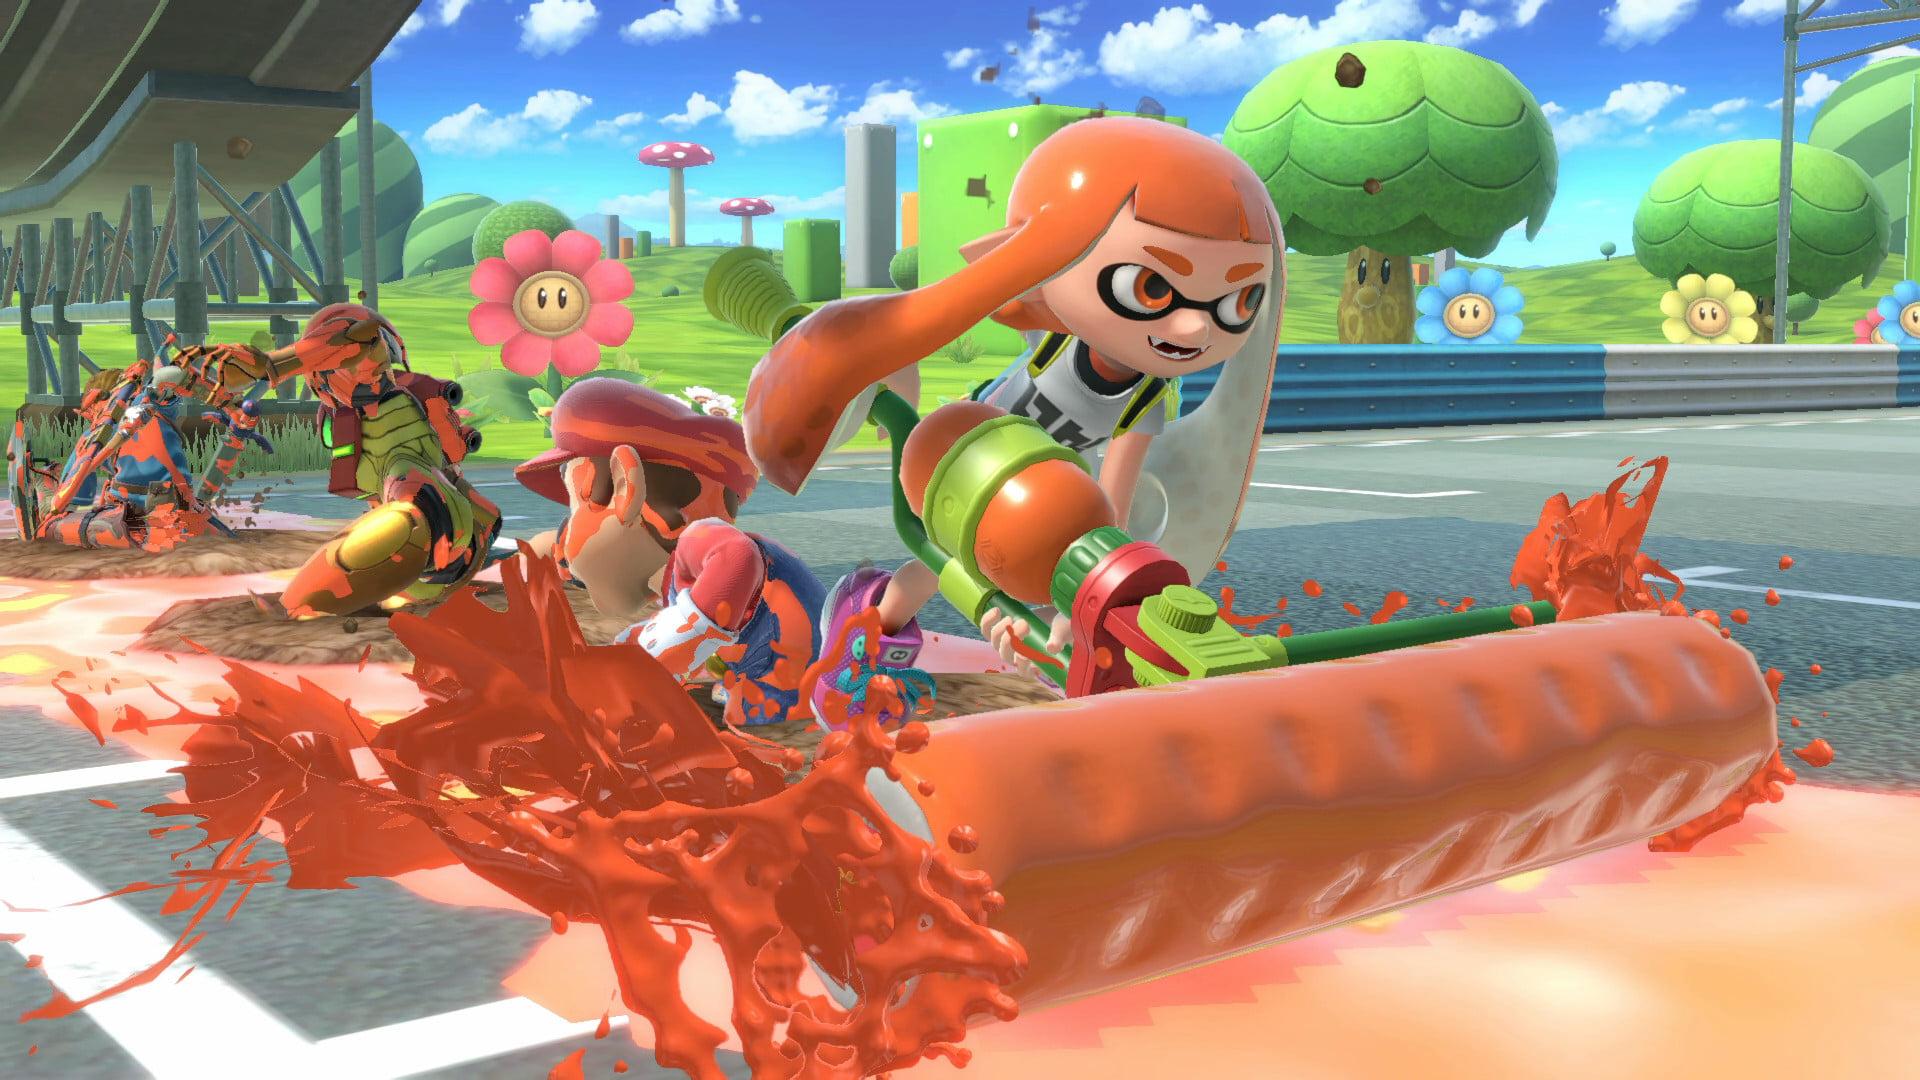 Super Smash Bros Ultimate, Smash Bros, Patch, Update, 1.2, This Week, Nintendo, Switch, Replays